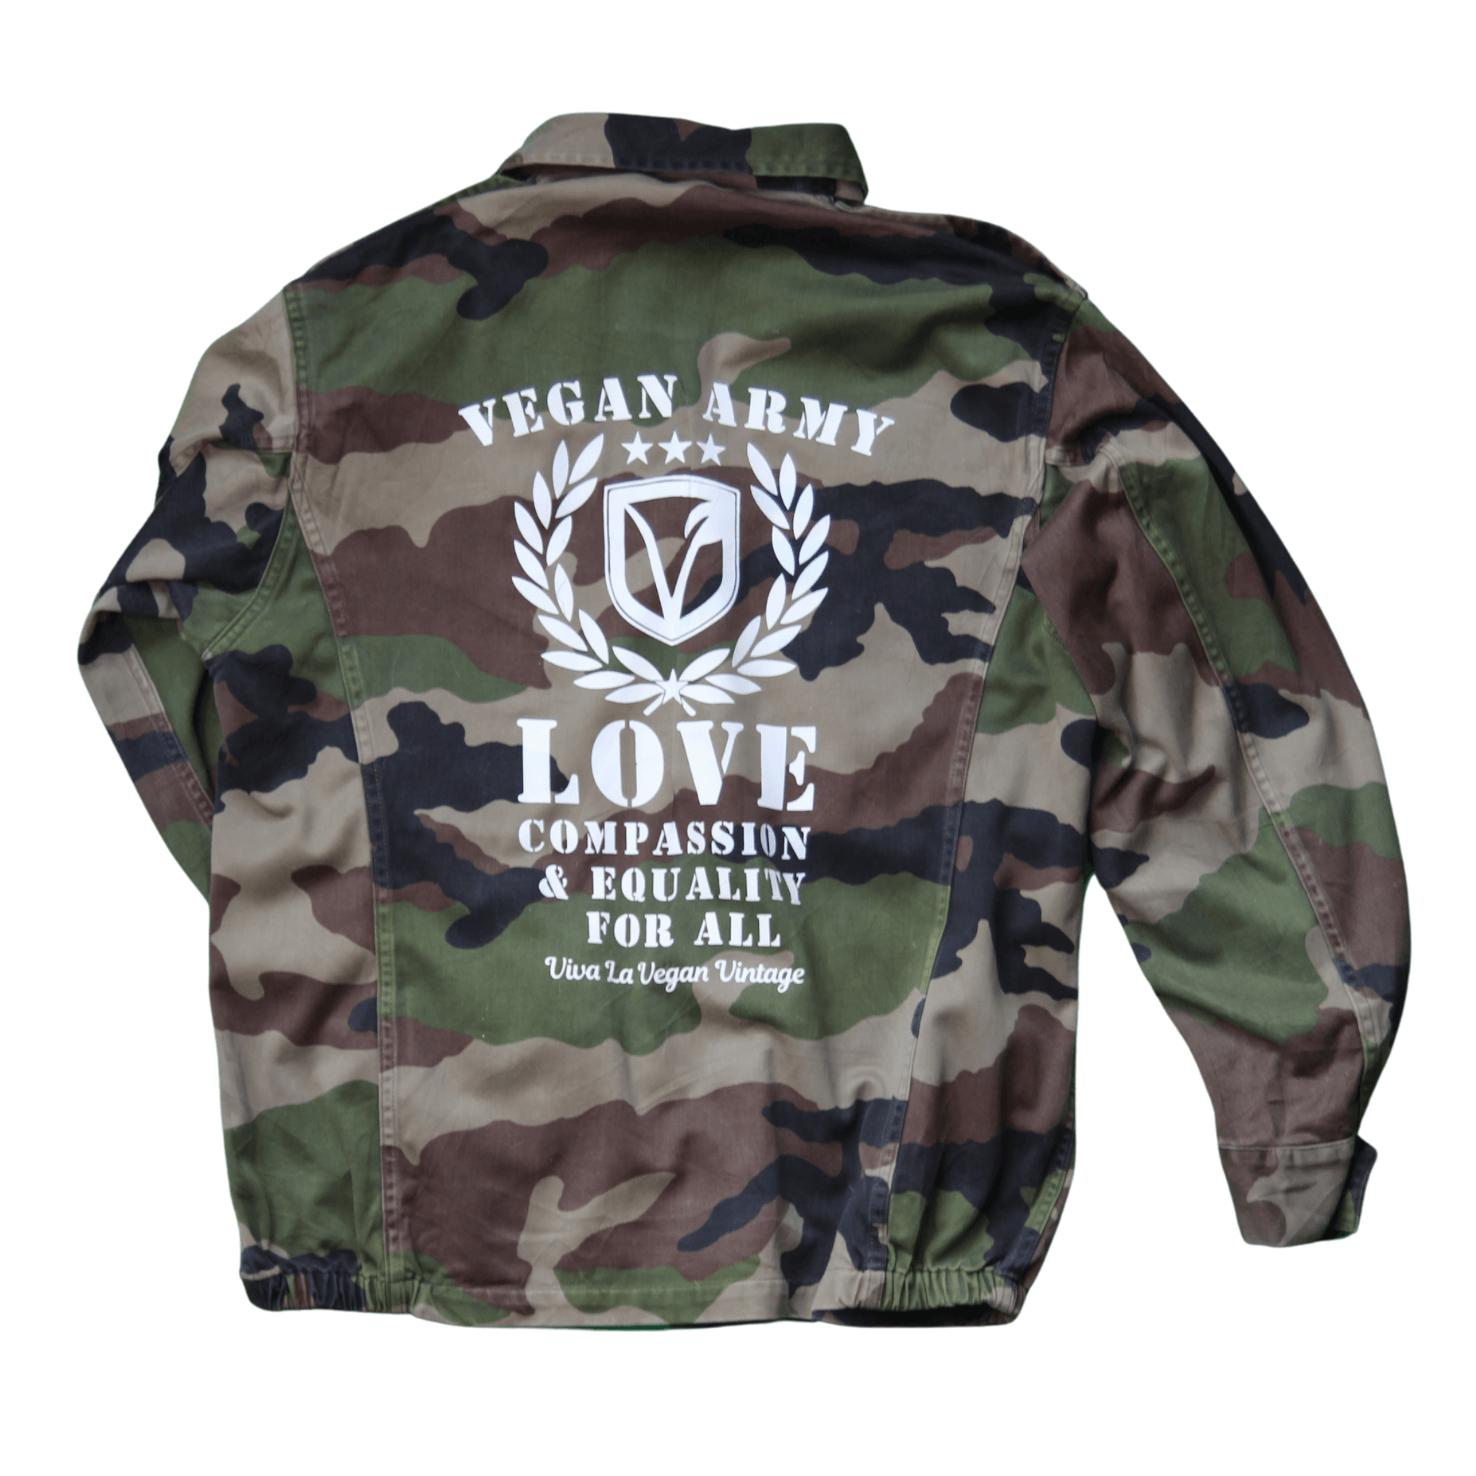 Viva La Vegan's Reworked Vegan Jacket comprising Vegan Army Screen Printed Vegan Army Jacket